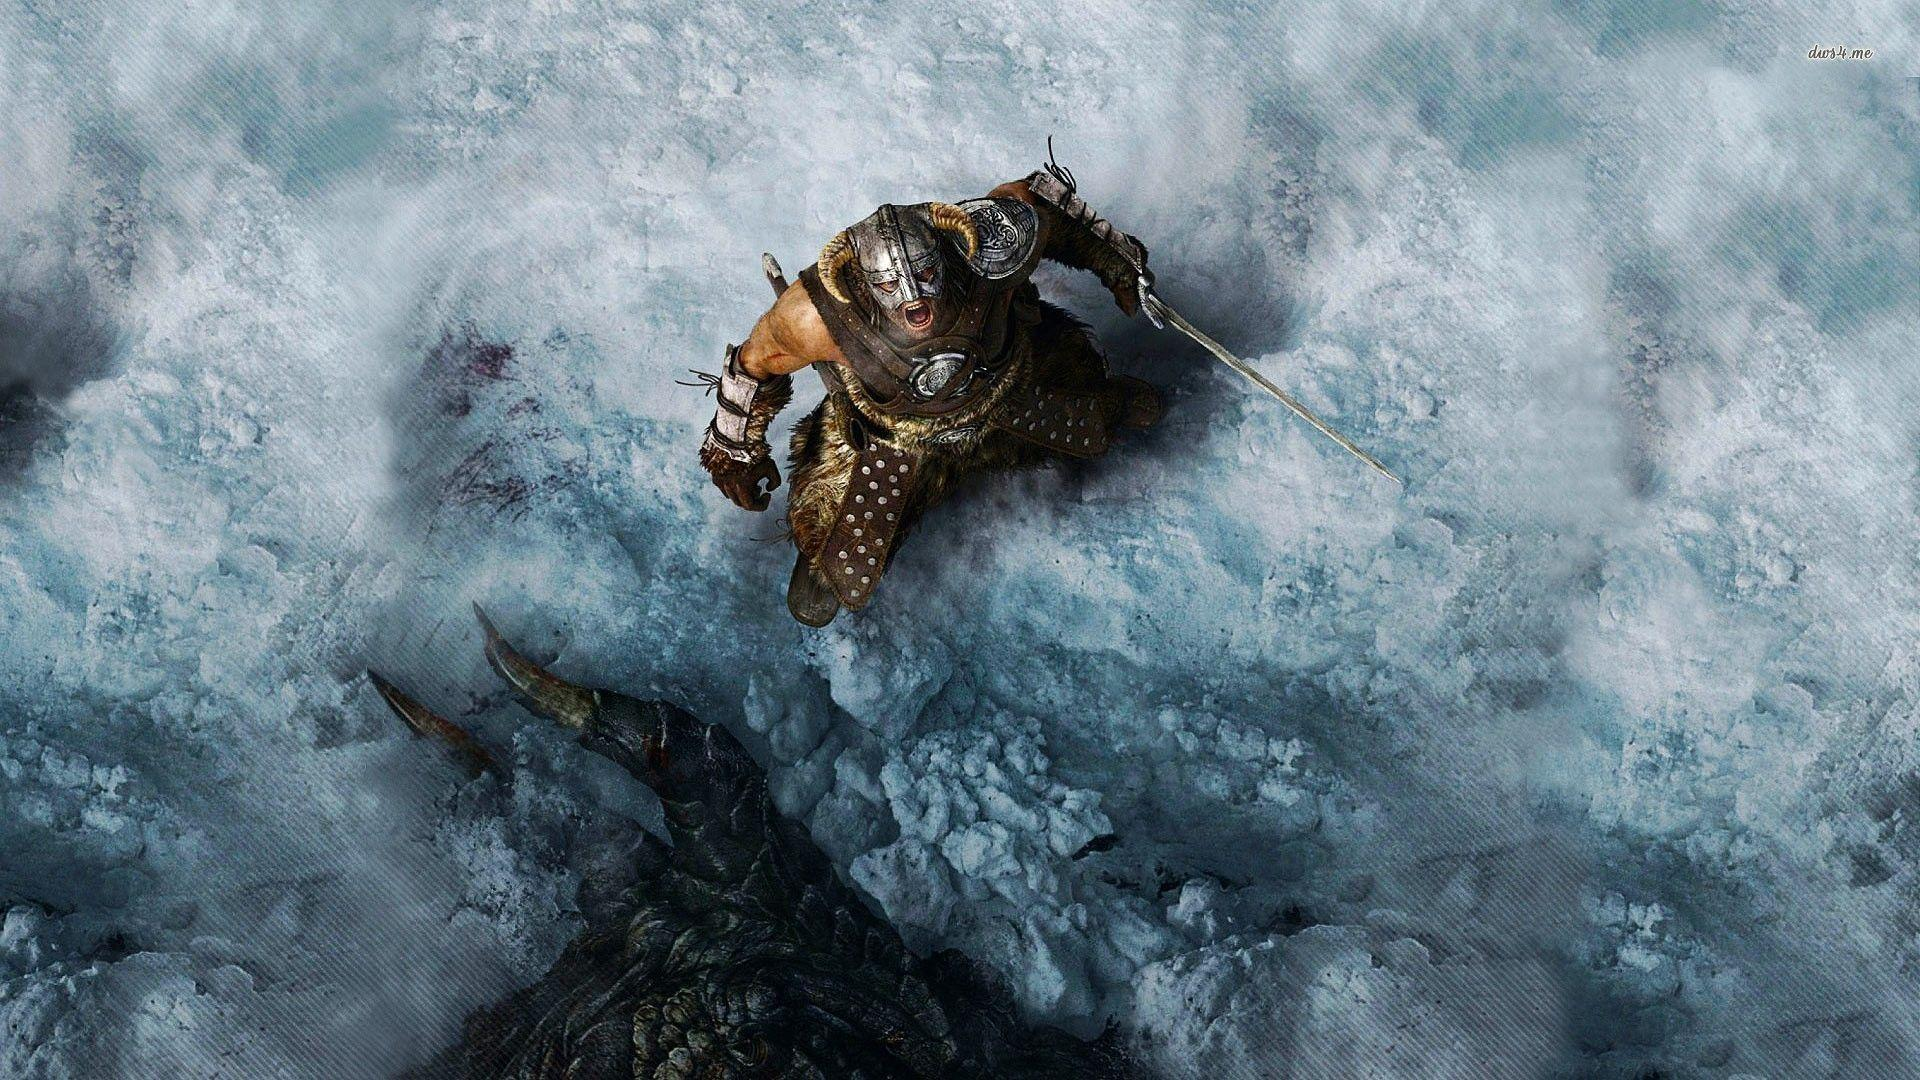 The Elder Scrolls V Skyrim Wallpapers - Wallpaper Cave